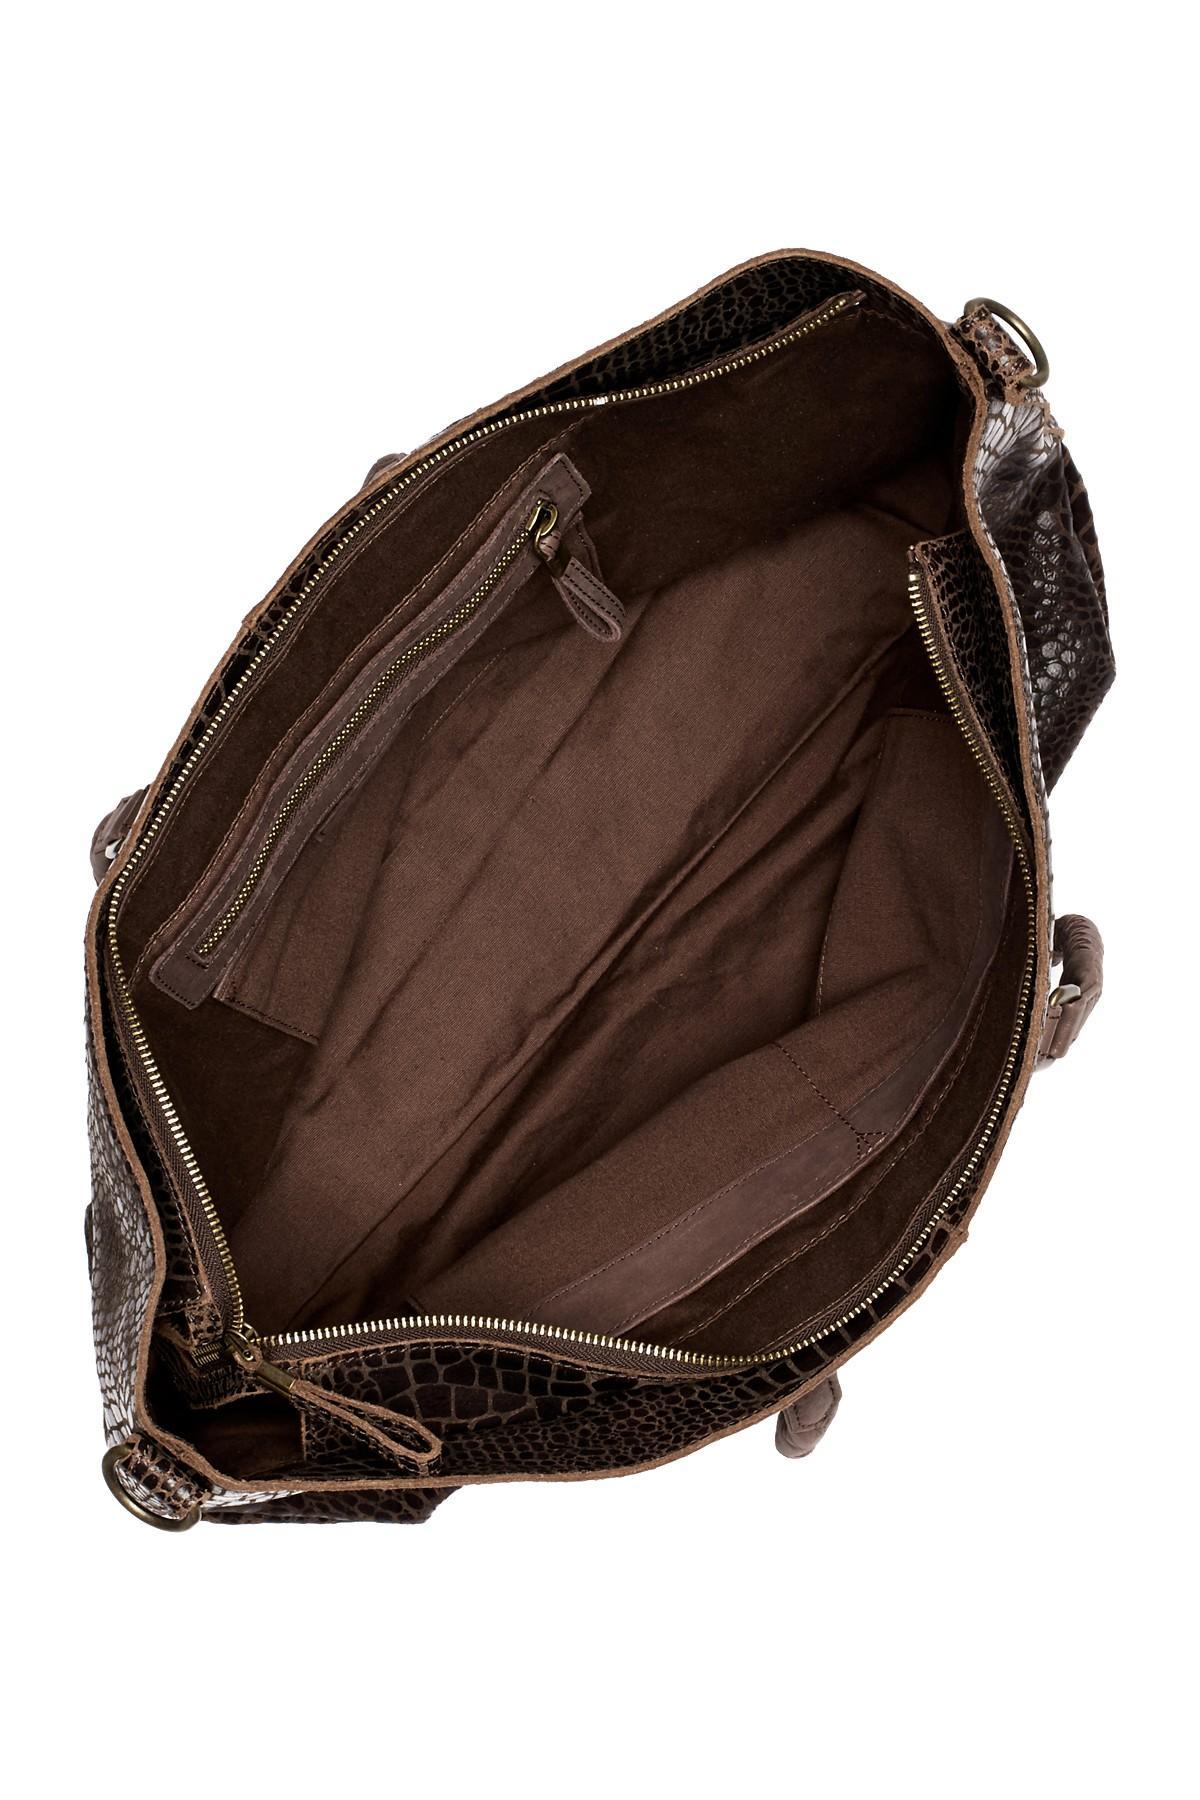 liebeskind berlin chelsea croc embossed leather tote in brown lyst. Black Bedroom Furniture Sets. Home Design Ideas